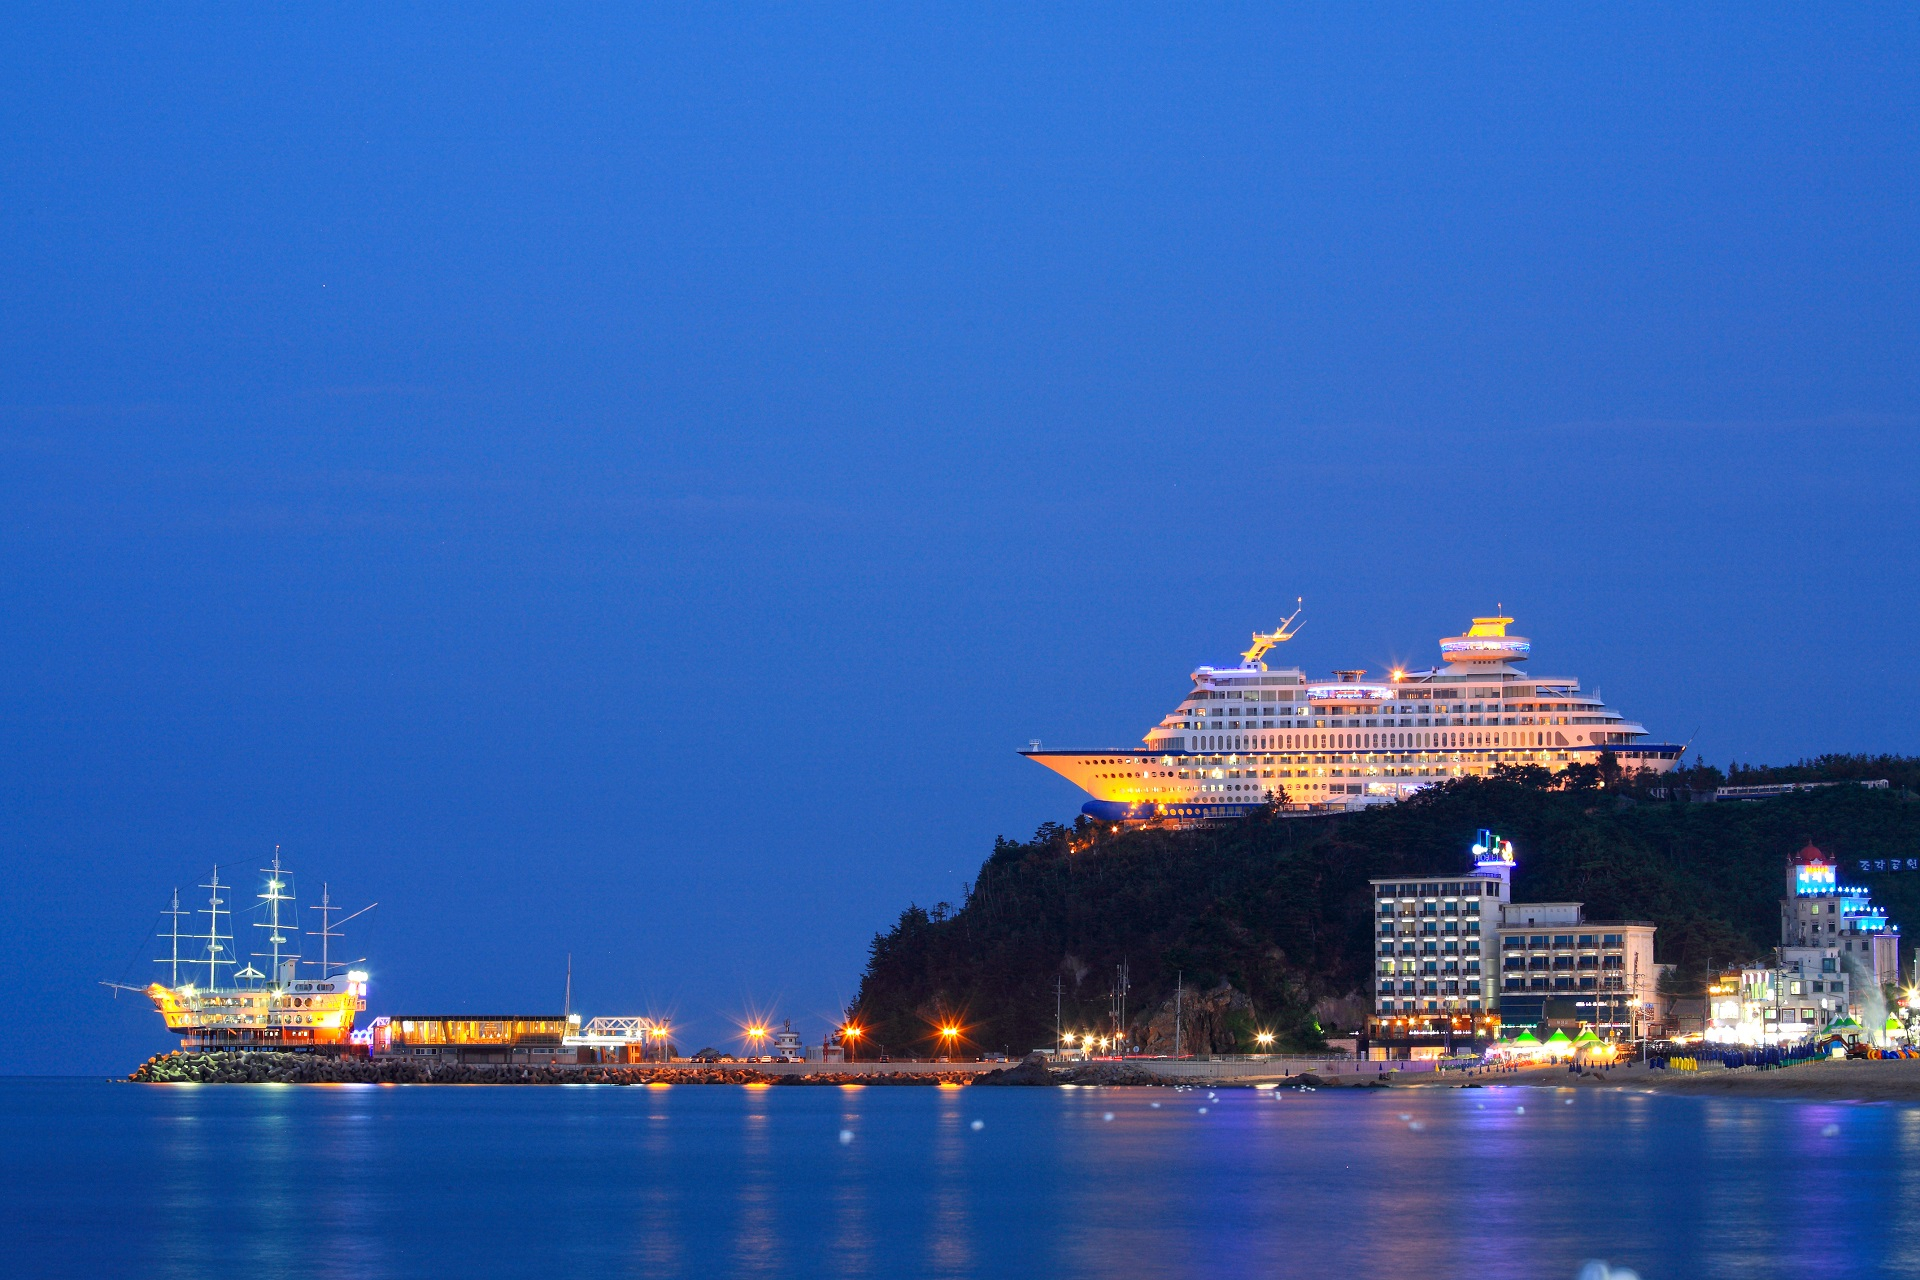 Das spektakuläre Sun & Cruise Hotel in Südkorea